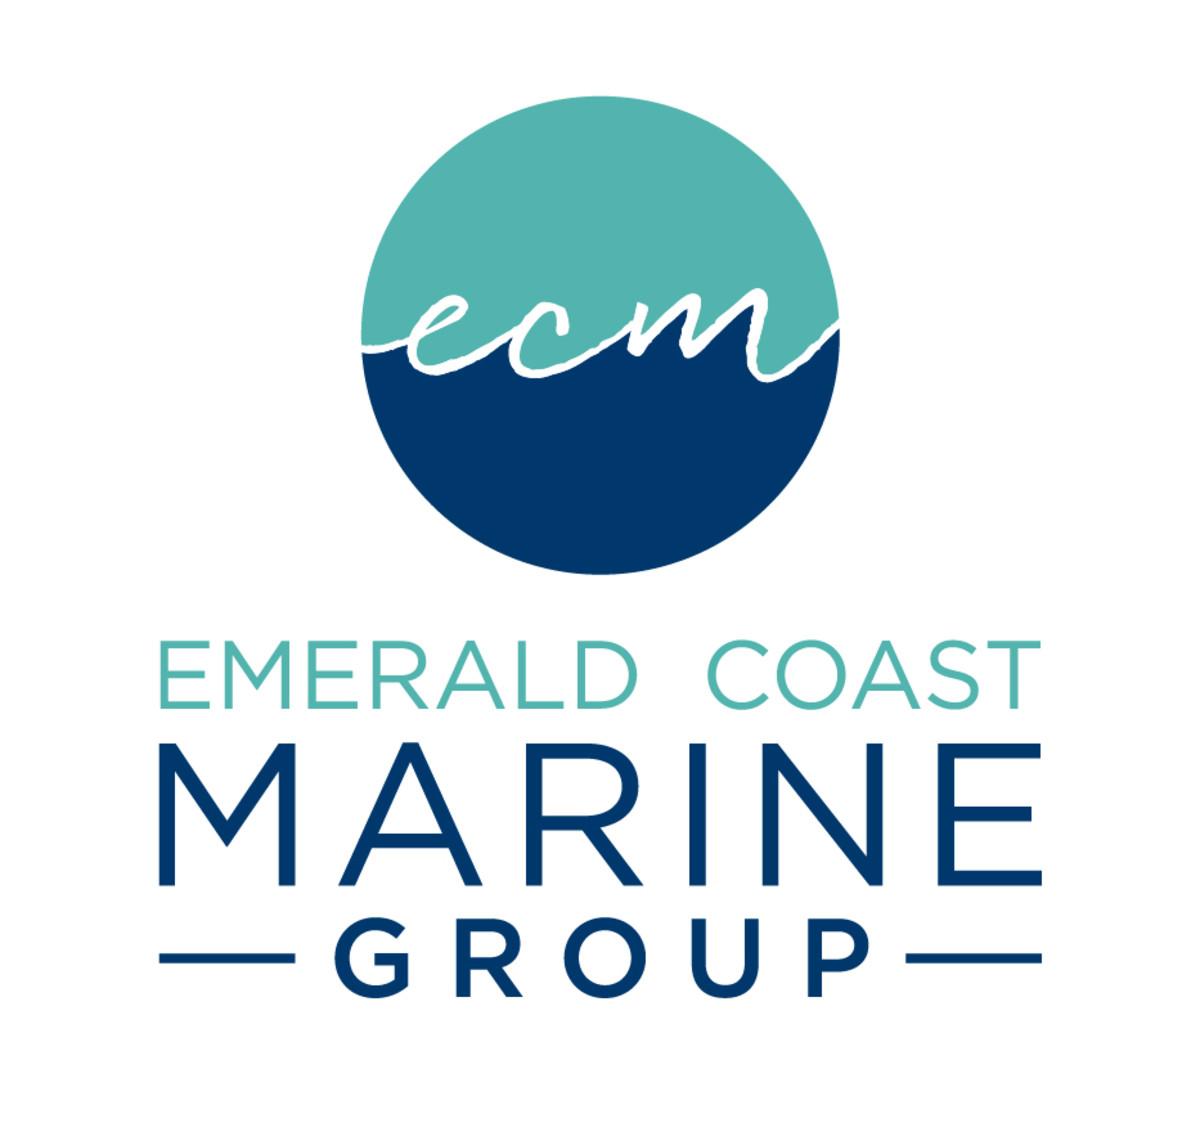 emerald coast marine group